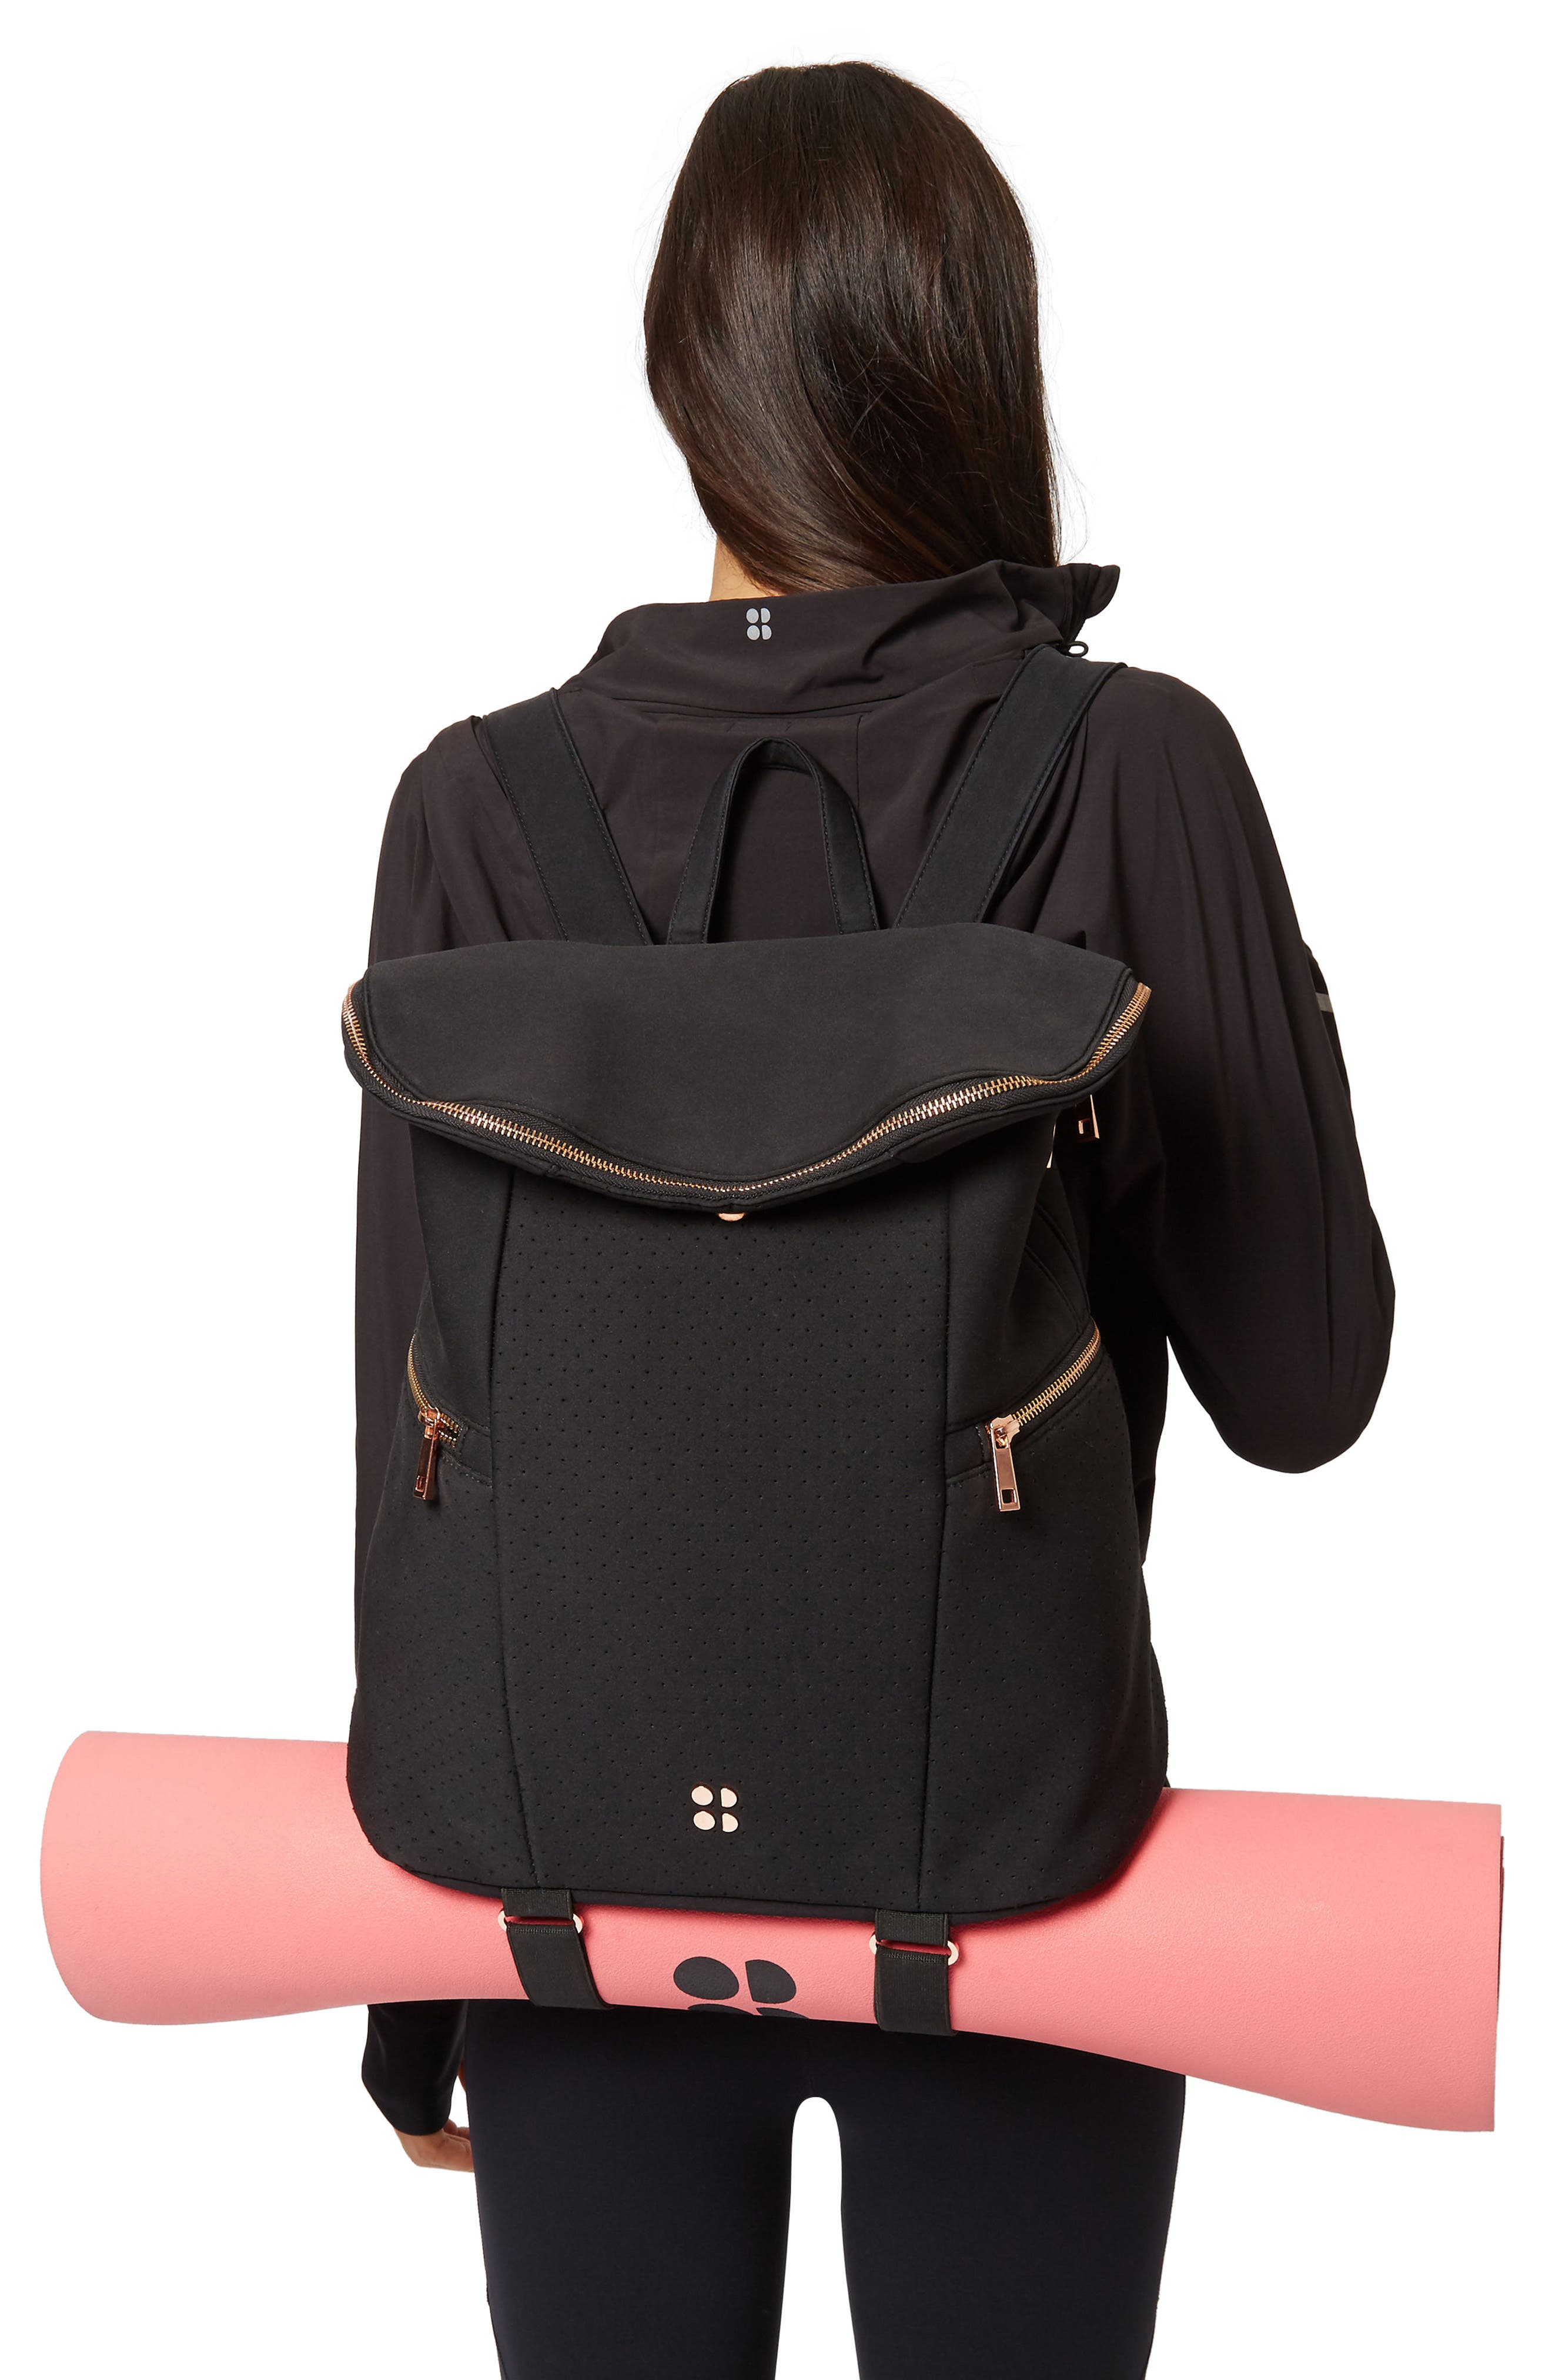 All Sport Backpack,                             Alternate thumbnail 2, color,                             001